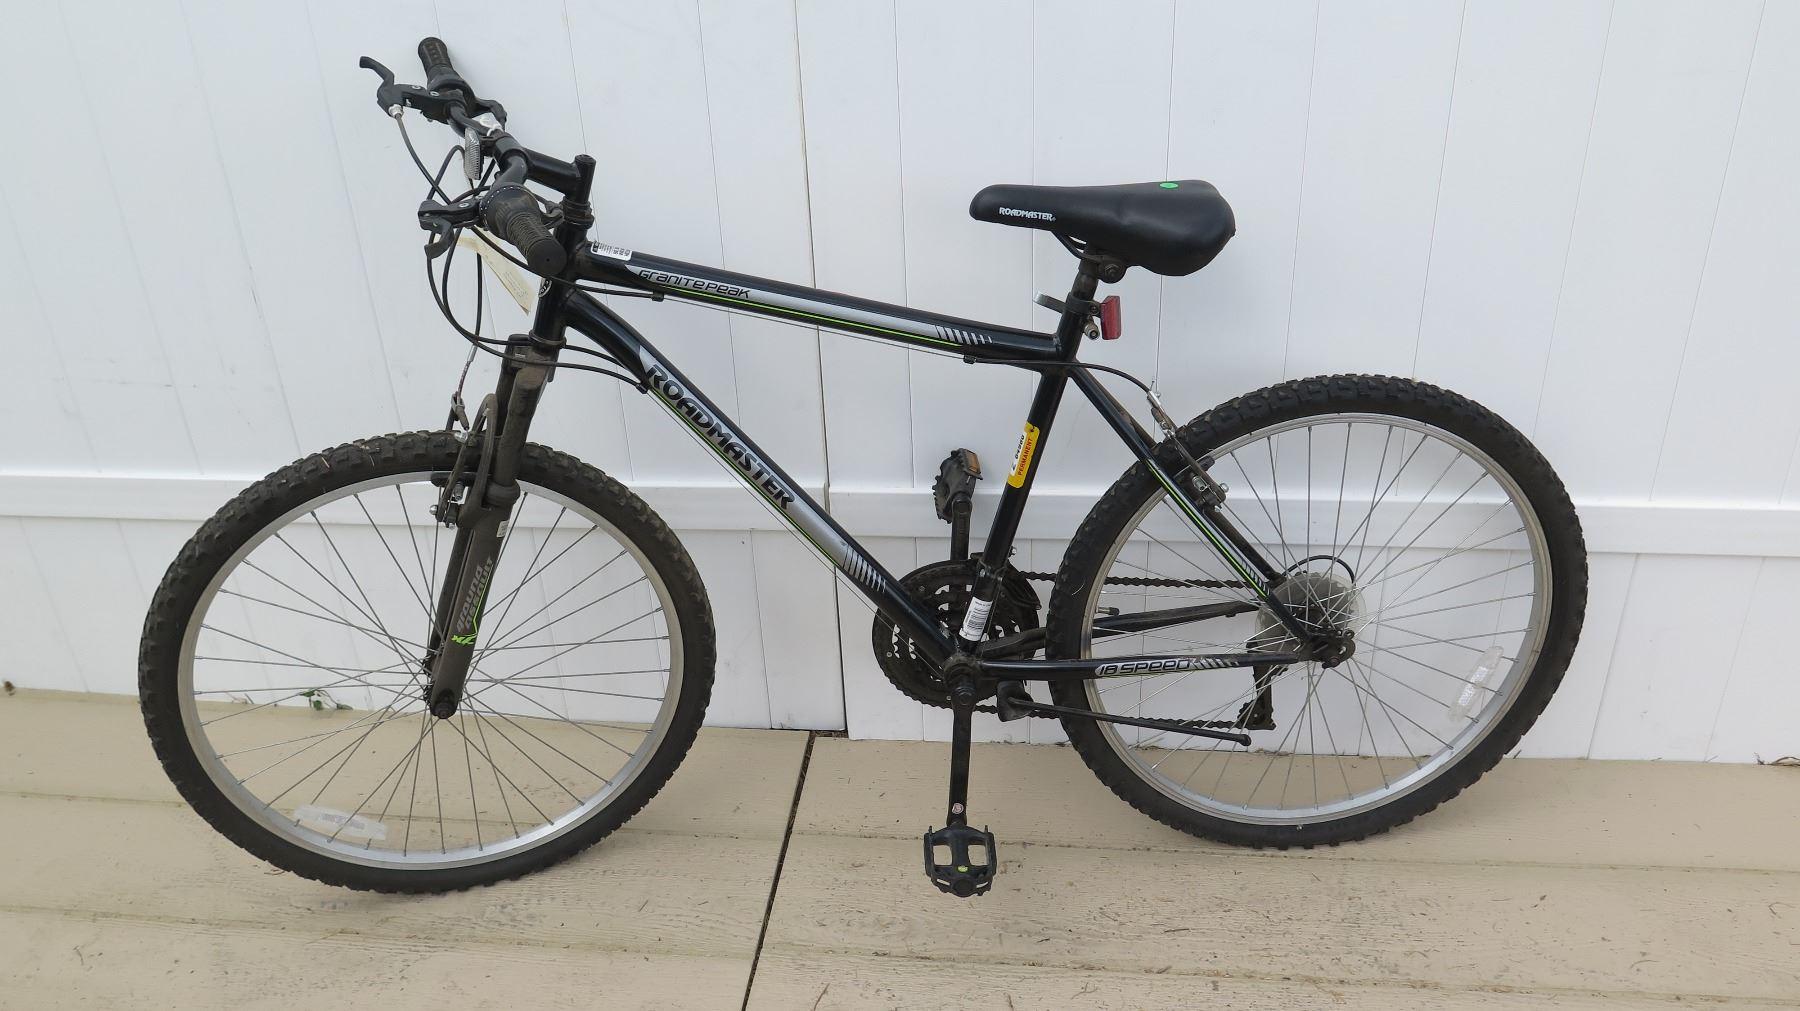 d6b74209c73 ... Image 18 : Roadmaster Granite Peak Men's 18 Speed Torque Drive Black  Gray Mountain Bike ...